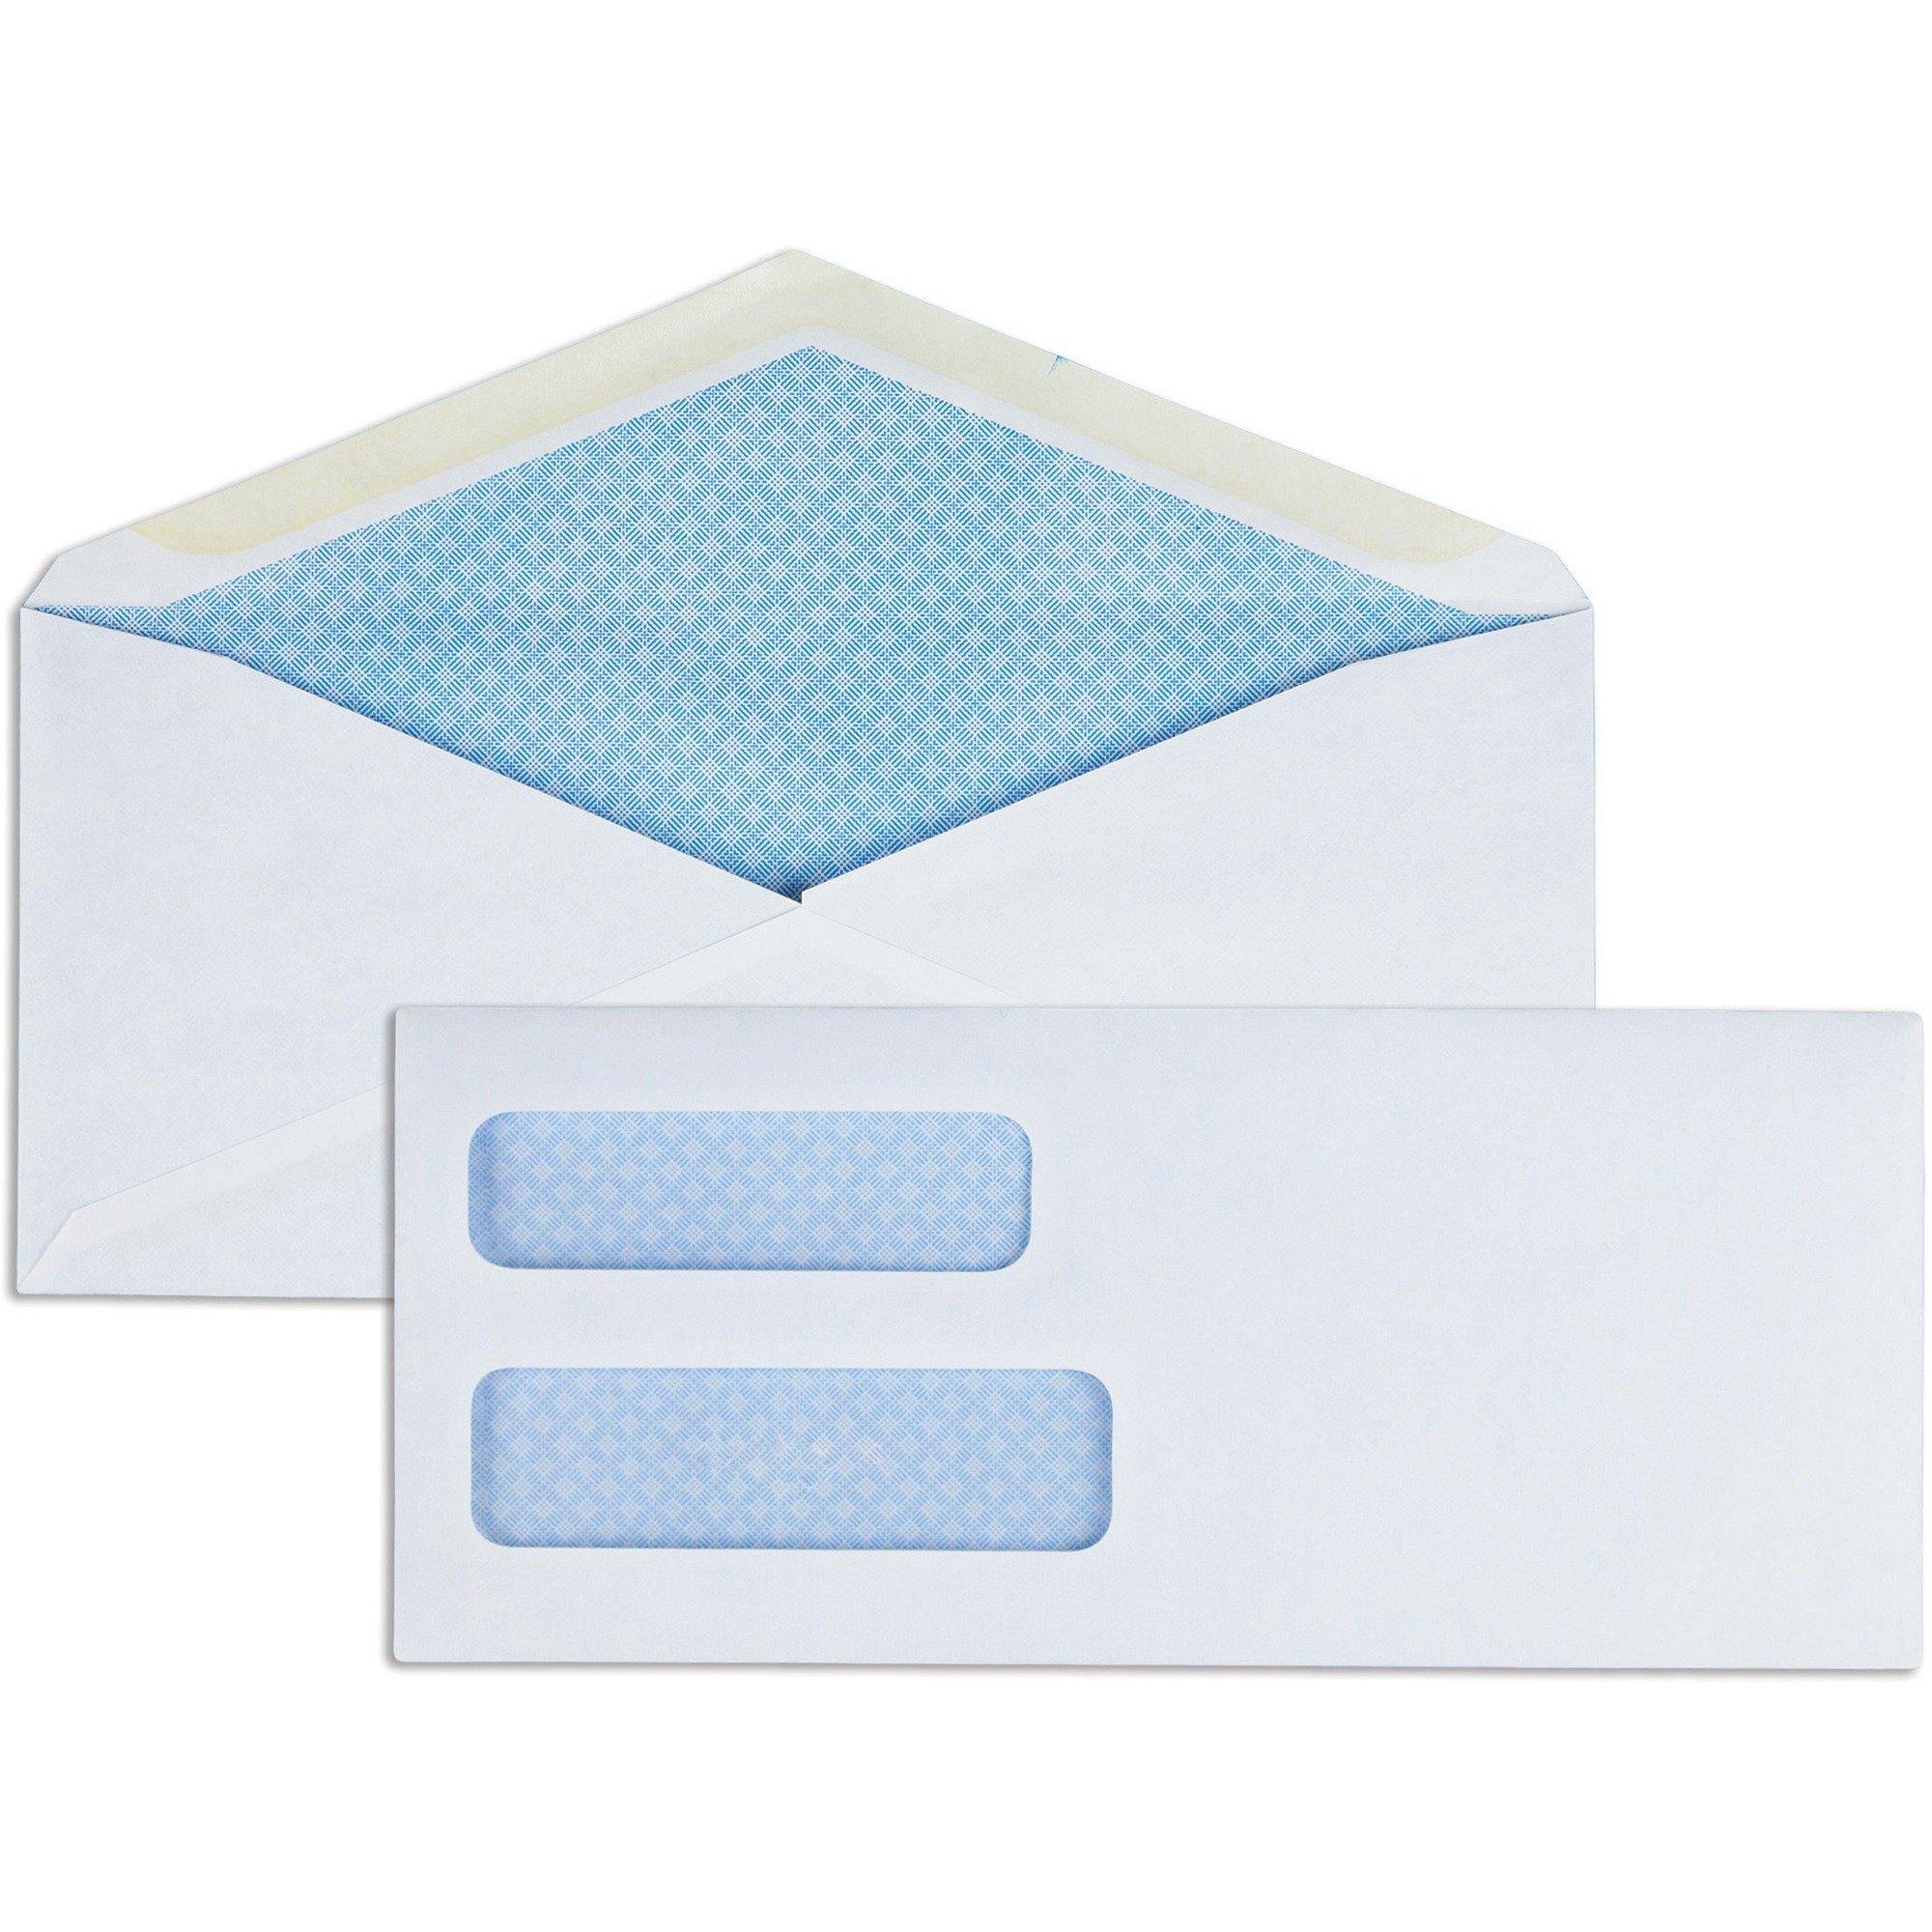 Business Source #9 Double Window Gummed Invoice Envelopes - 500/Pack